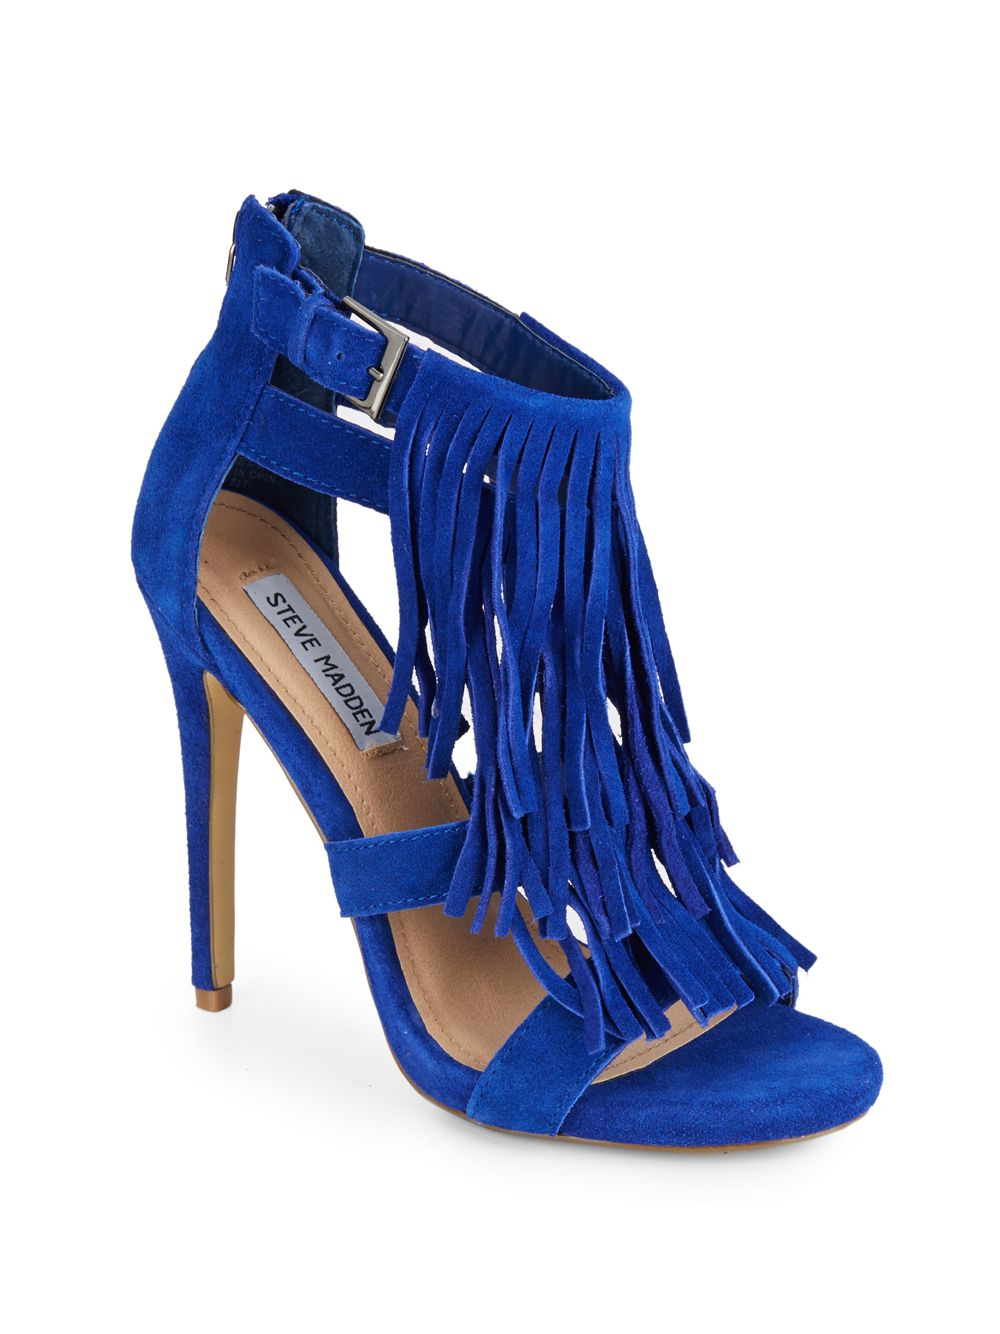 Steve Madden Bakirr Suede Fringe Sandals In Blue Lyst